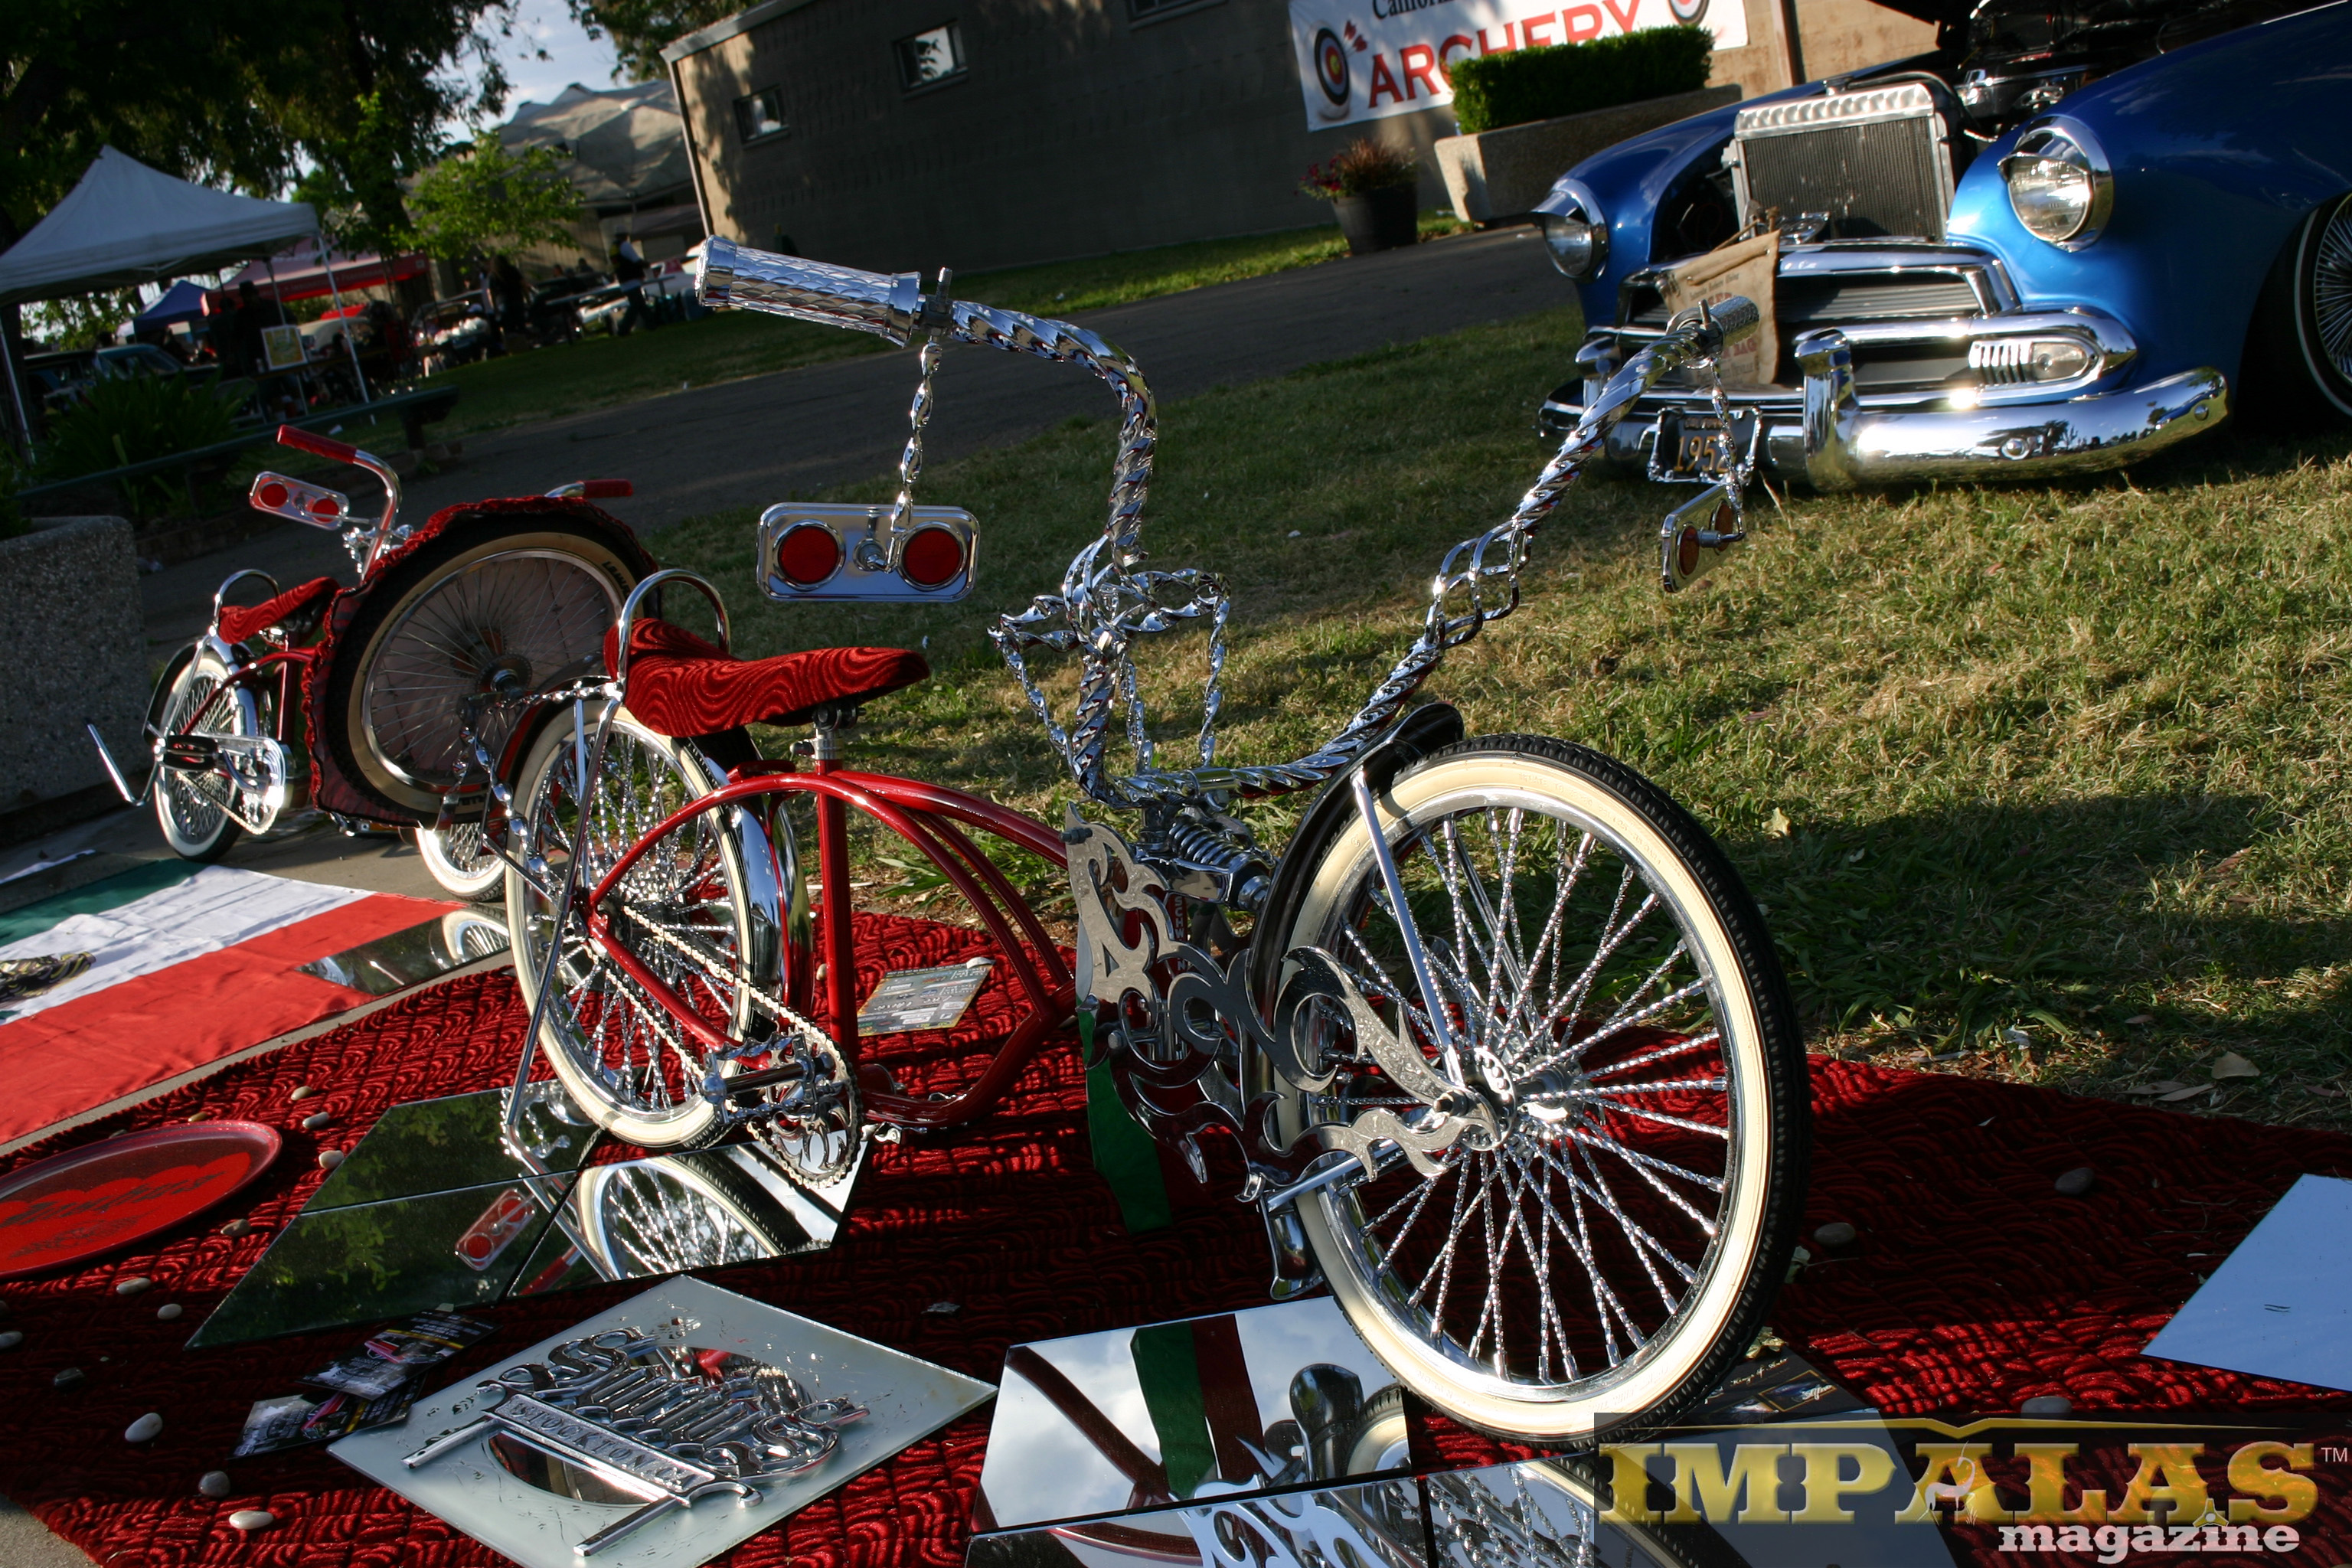 Impalasmagazine050116StocktonLowriderSupershow217.jpg